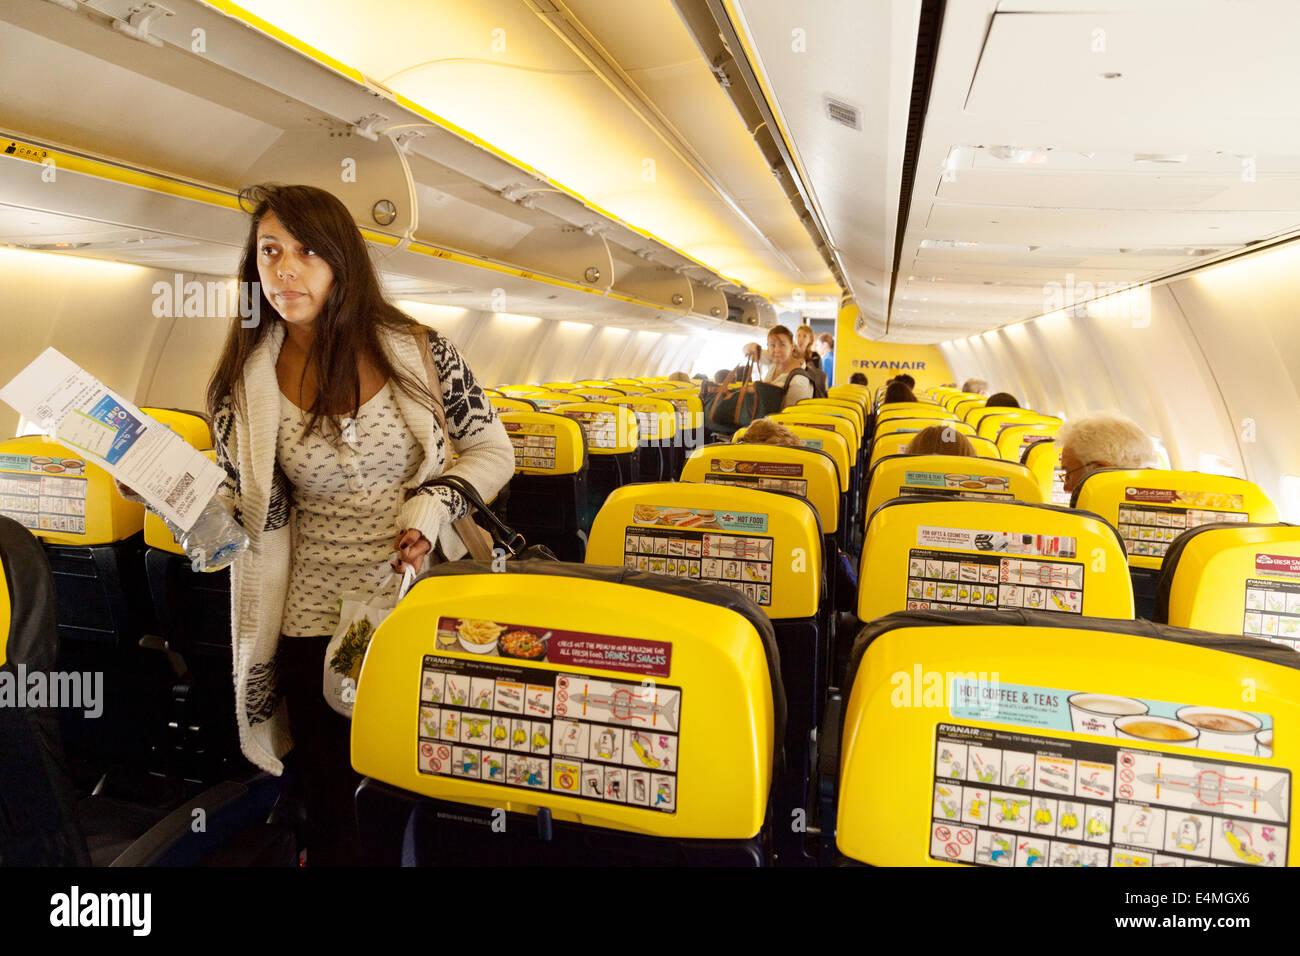 Passengers finding their seats, Ryanair plane cabin interior - Stock Image